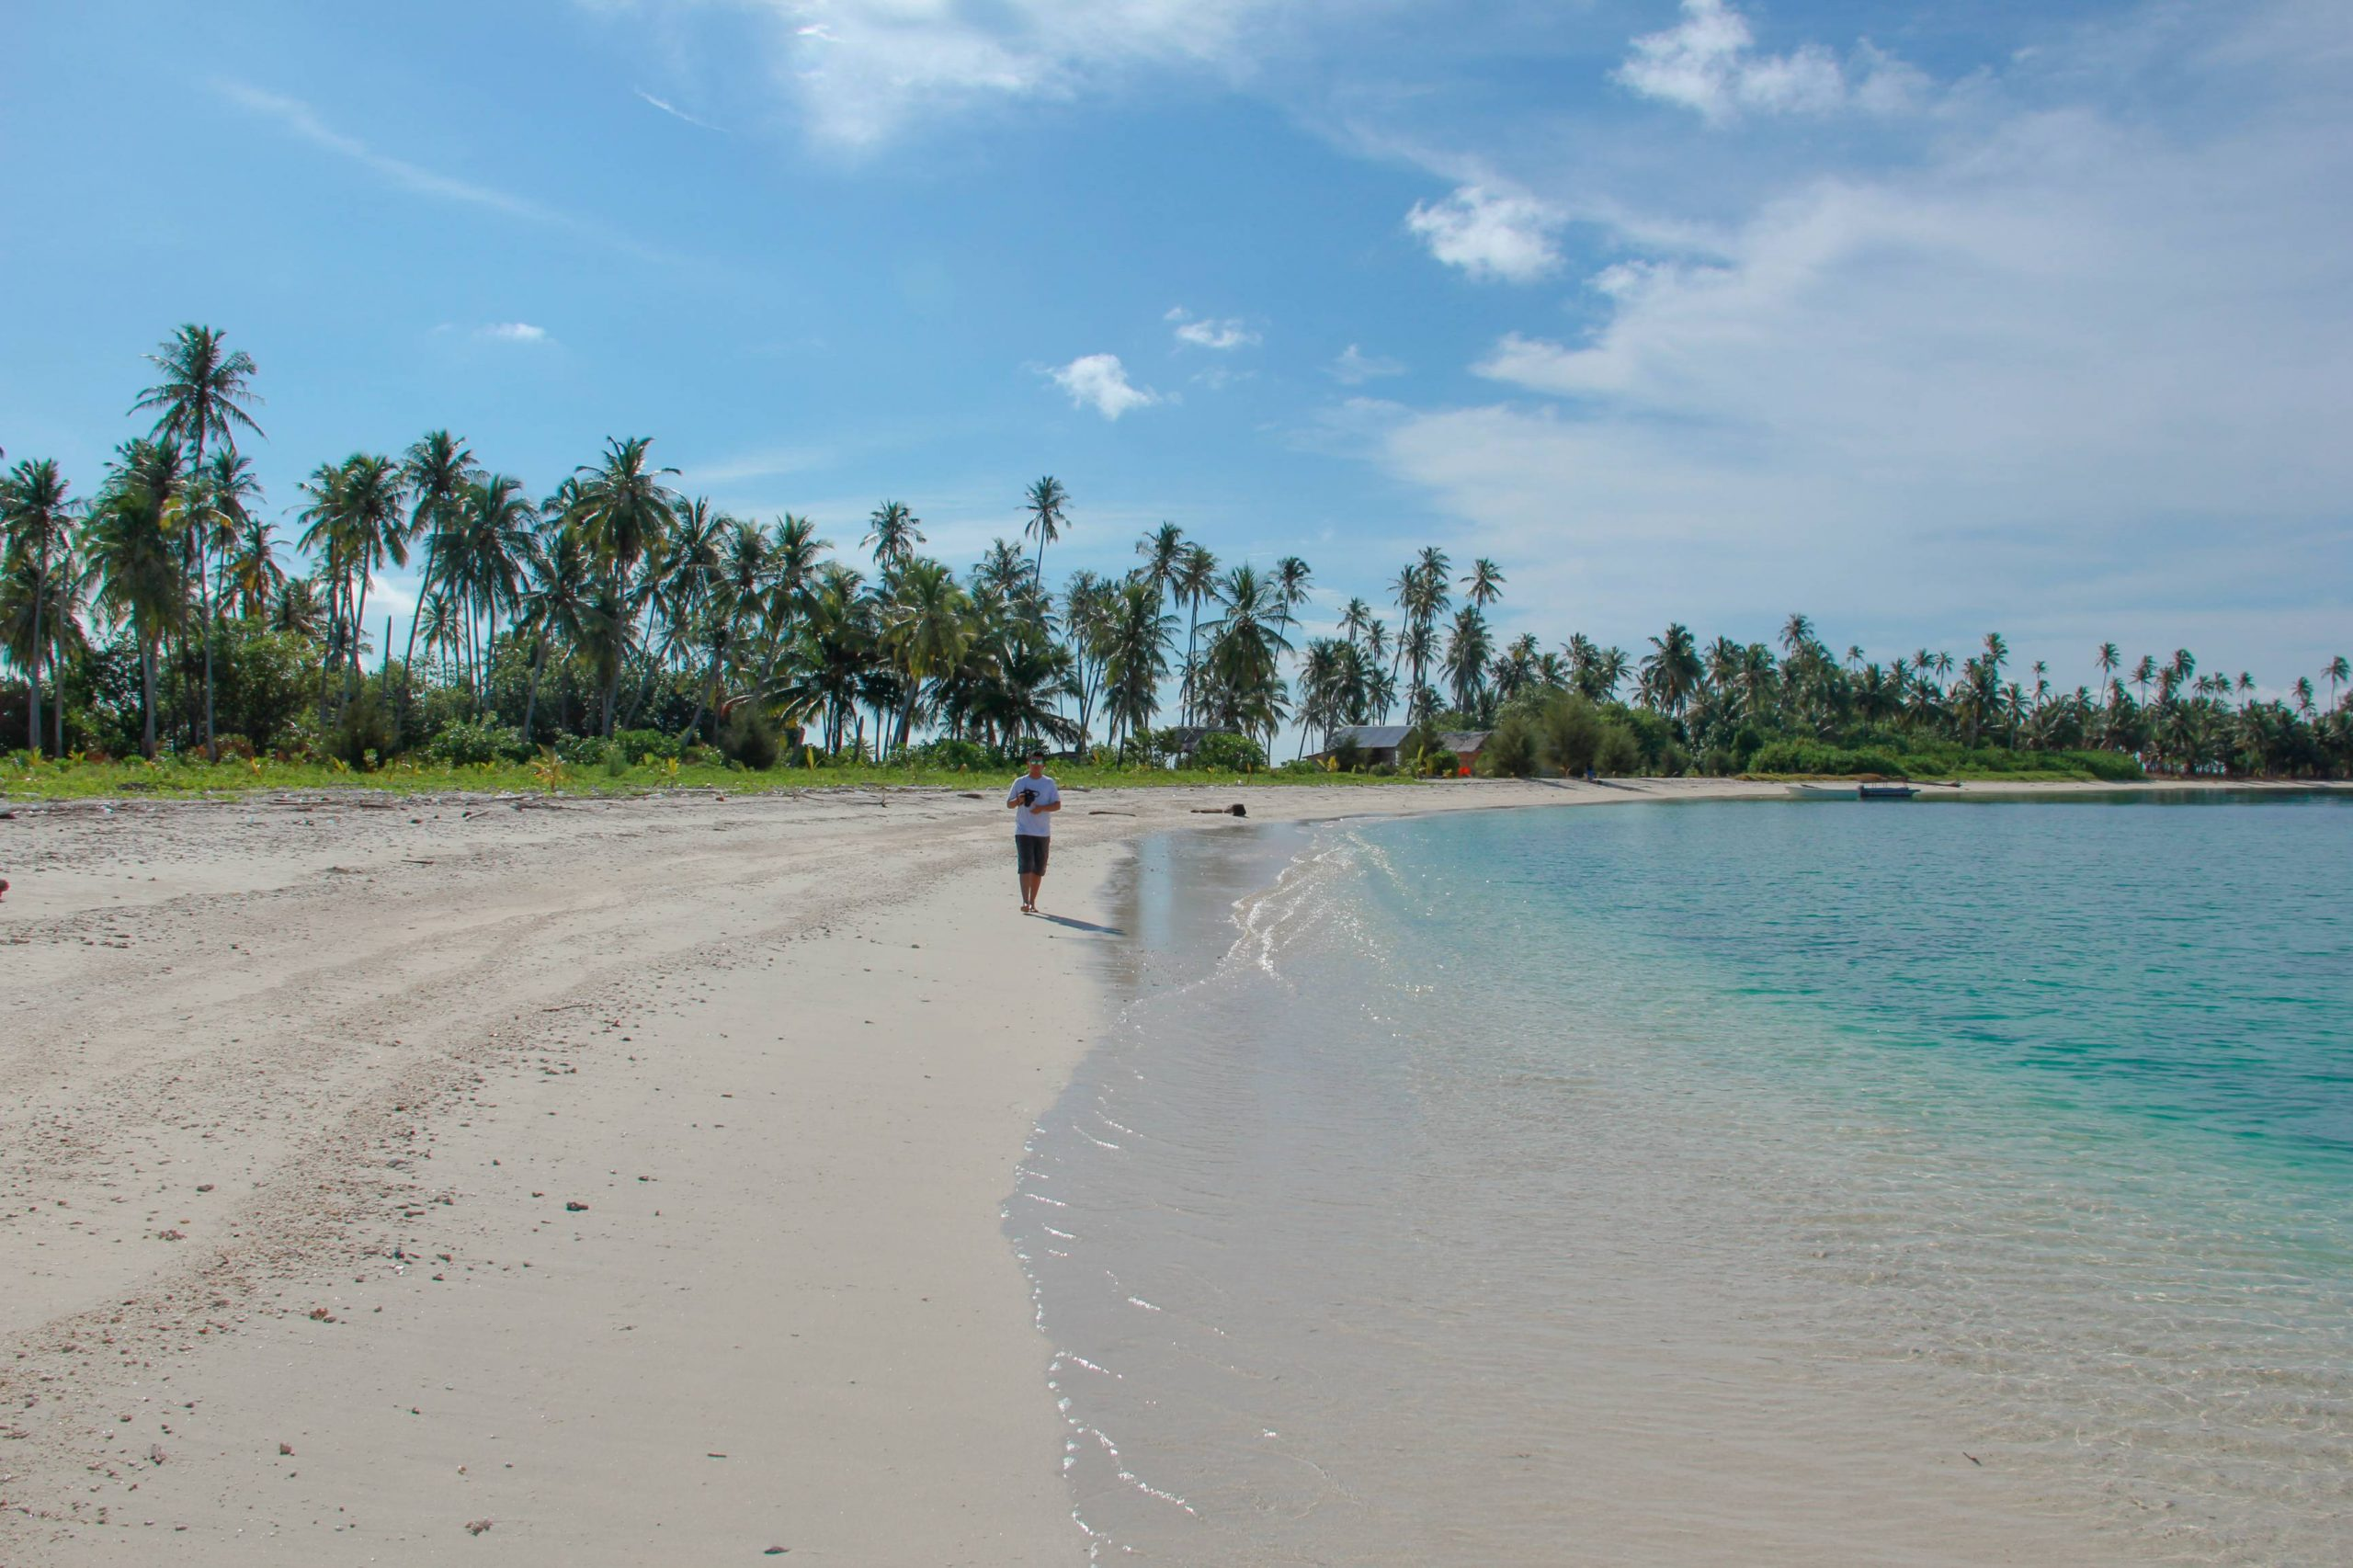 Pulau_Panjang_Ponjria9_compressed